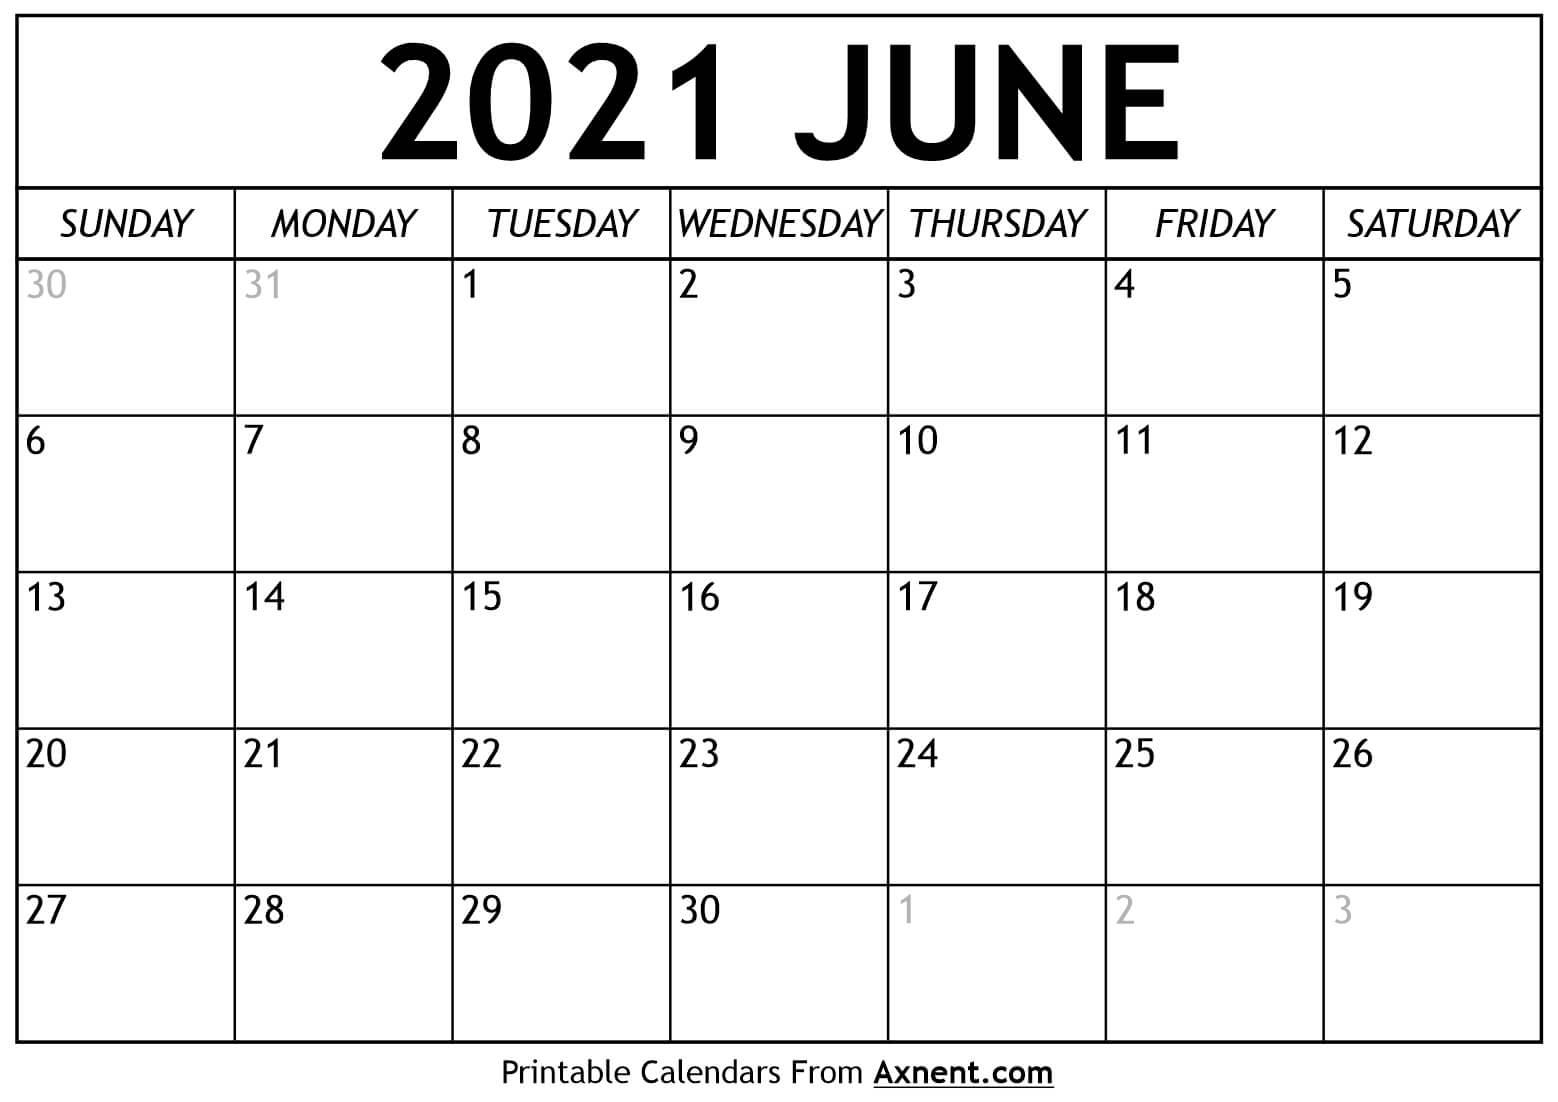 Printable July 2021 Calendar Template - Print Now